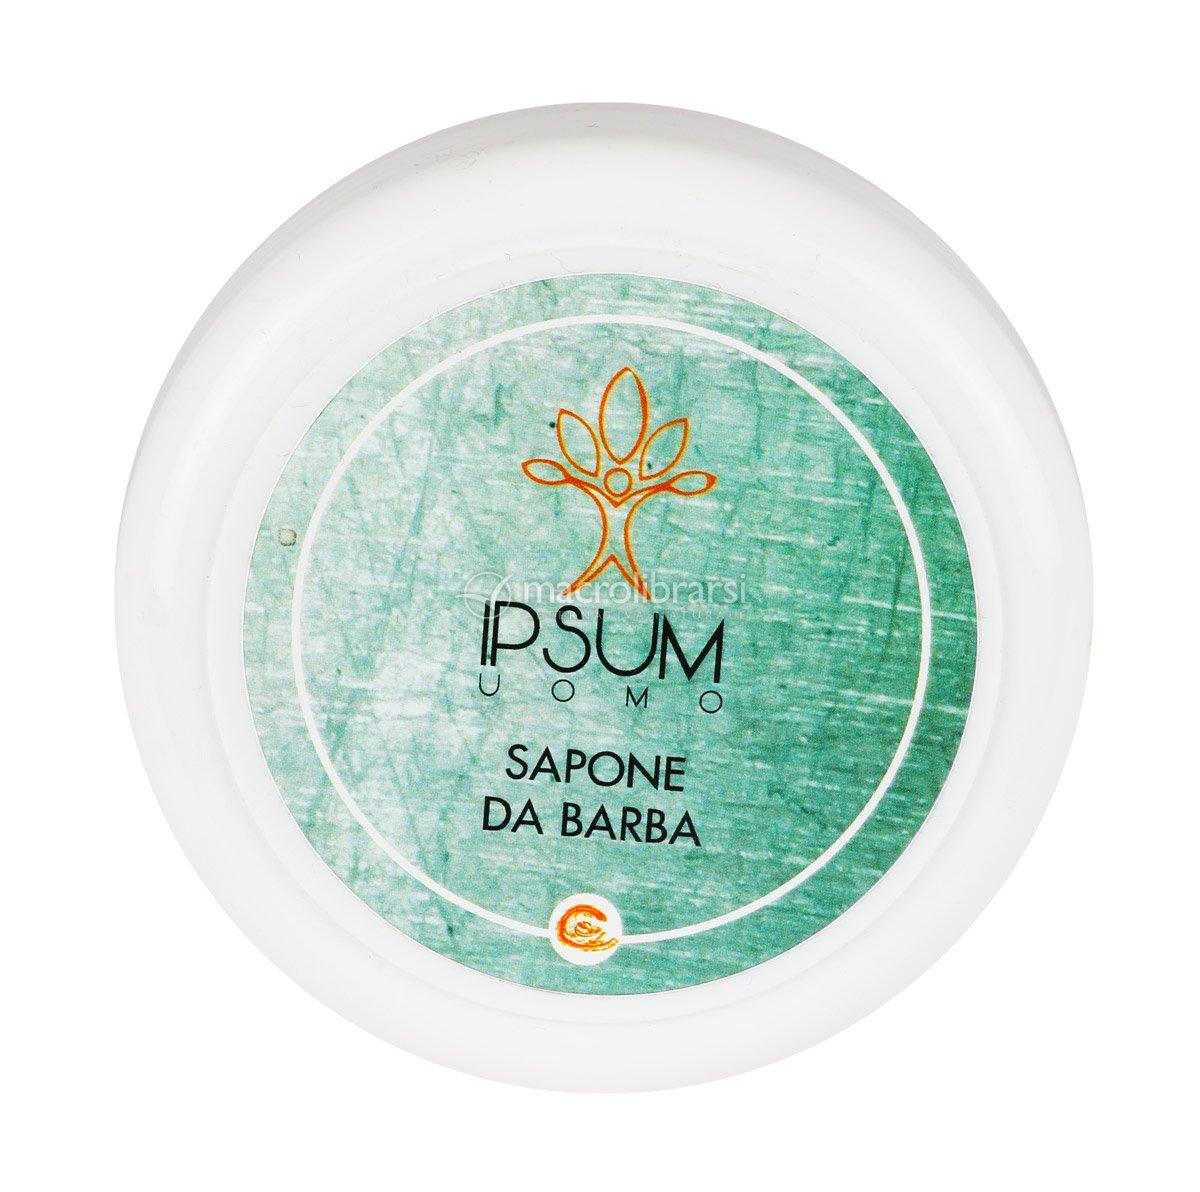 Sapone da Barba - Ipsum Uomo